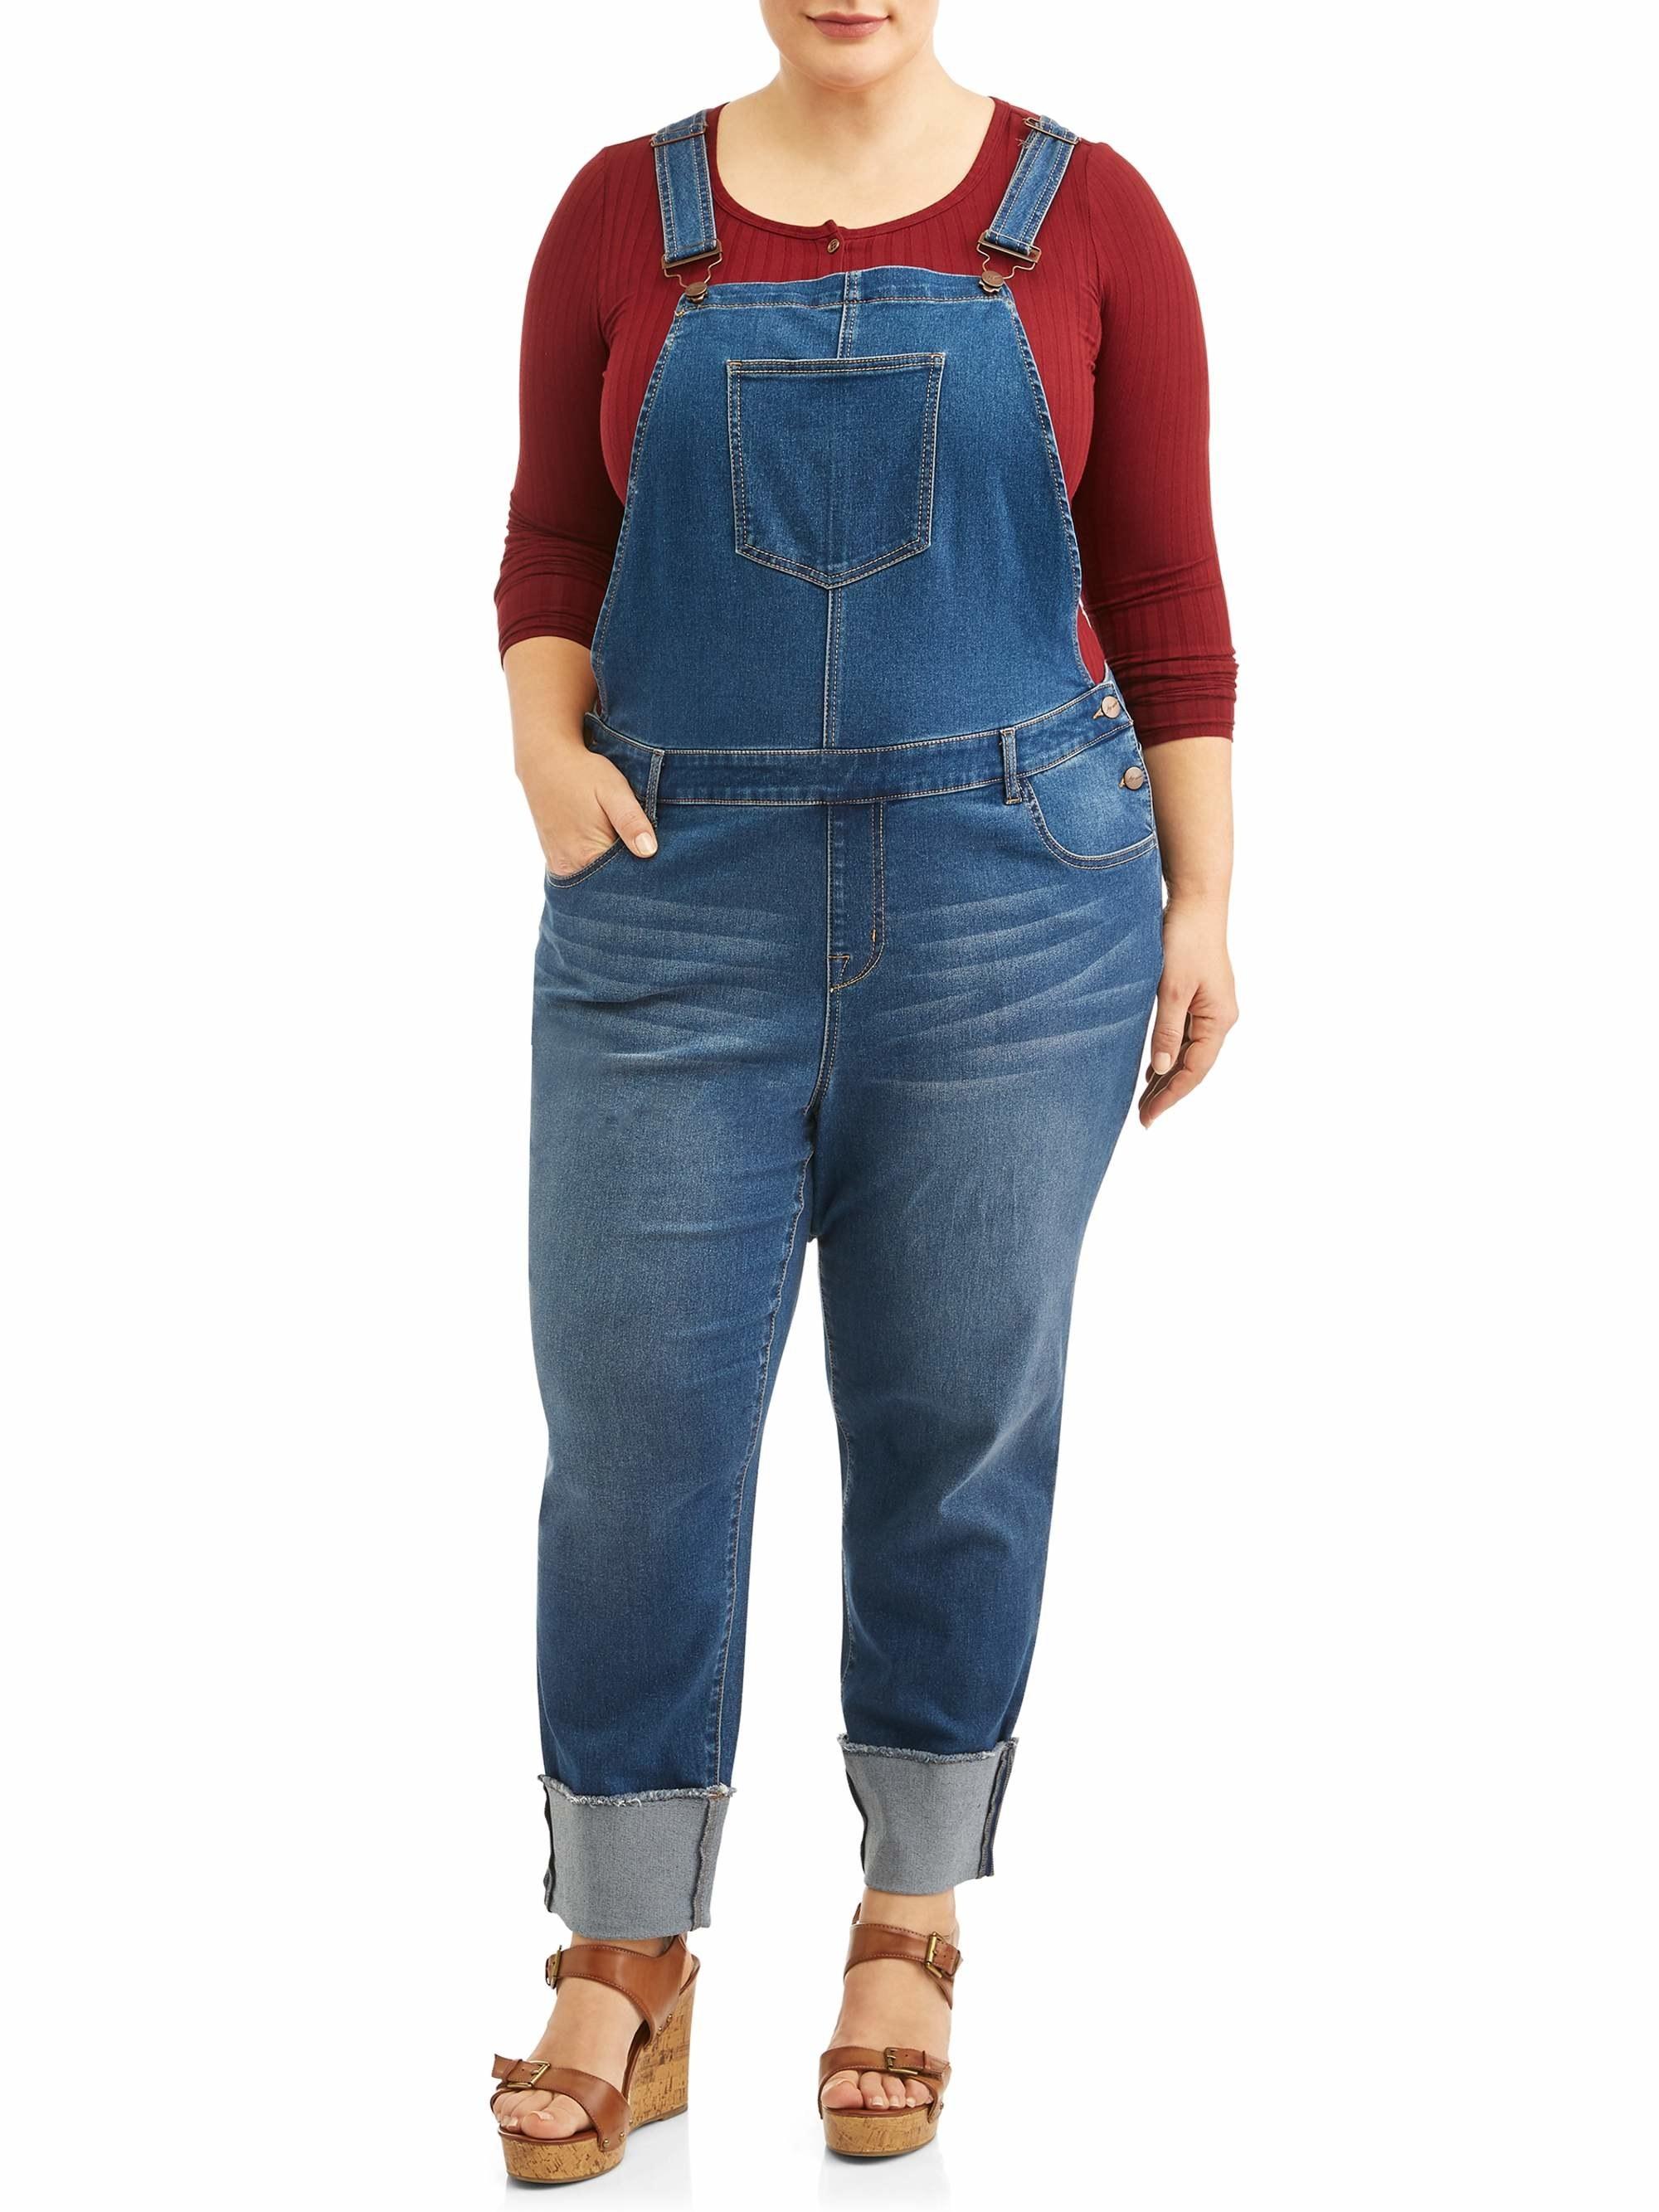 Model wearing medium wash denim overalls